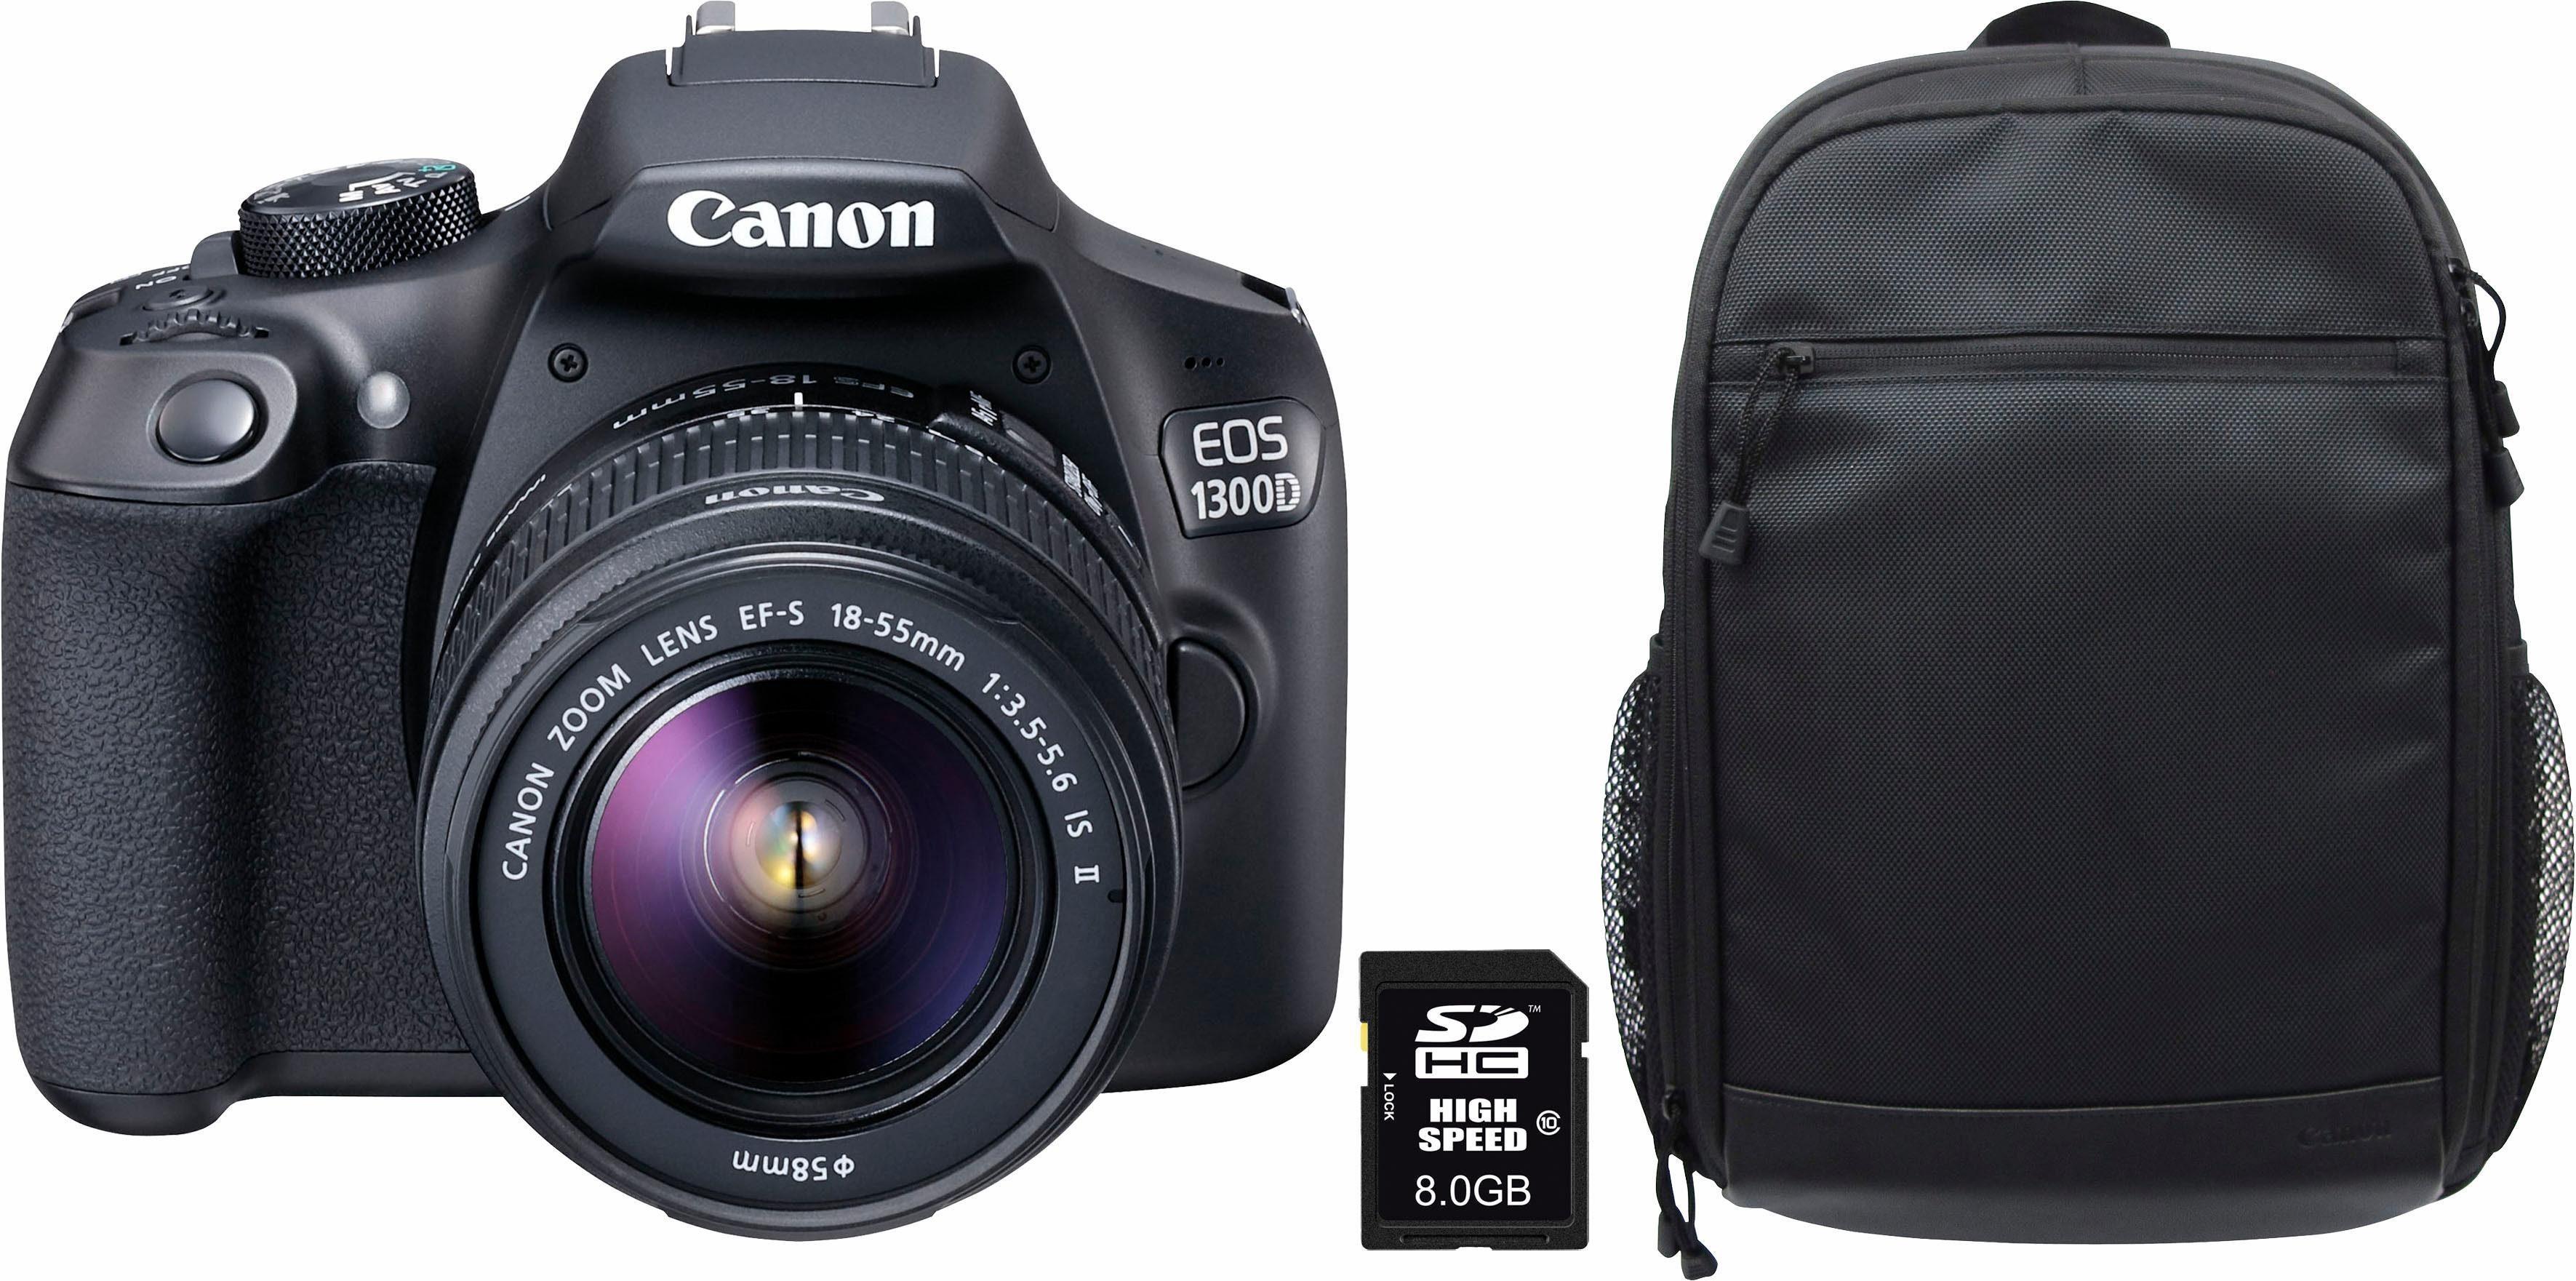 Canon »1300D 18-55 IS« Spiegelreflexkamera (EF-S 18-55mm IS II, 18 MP, NFC, WLAN (Wi-Fi), Outdoor-Modus, High-Speed-Modus)